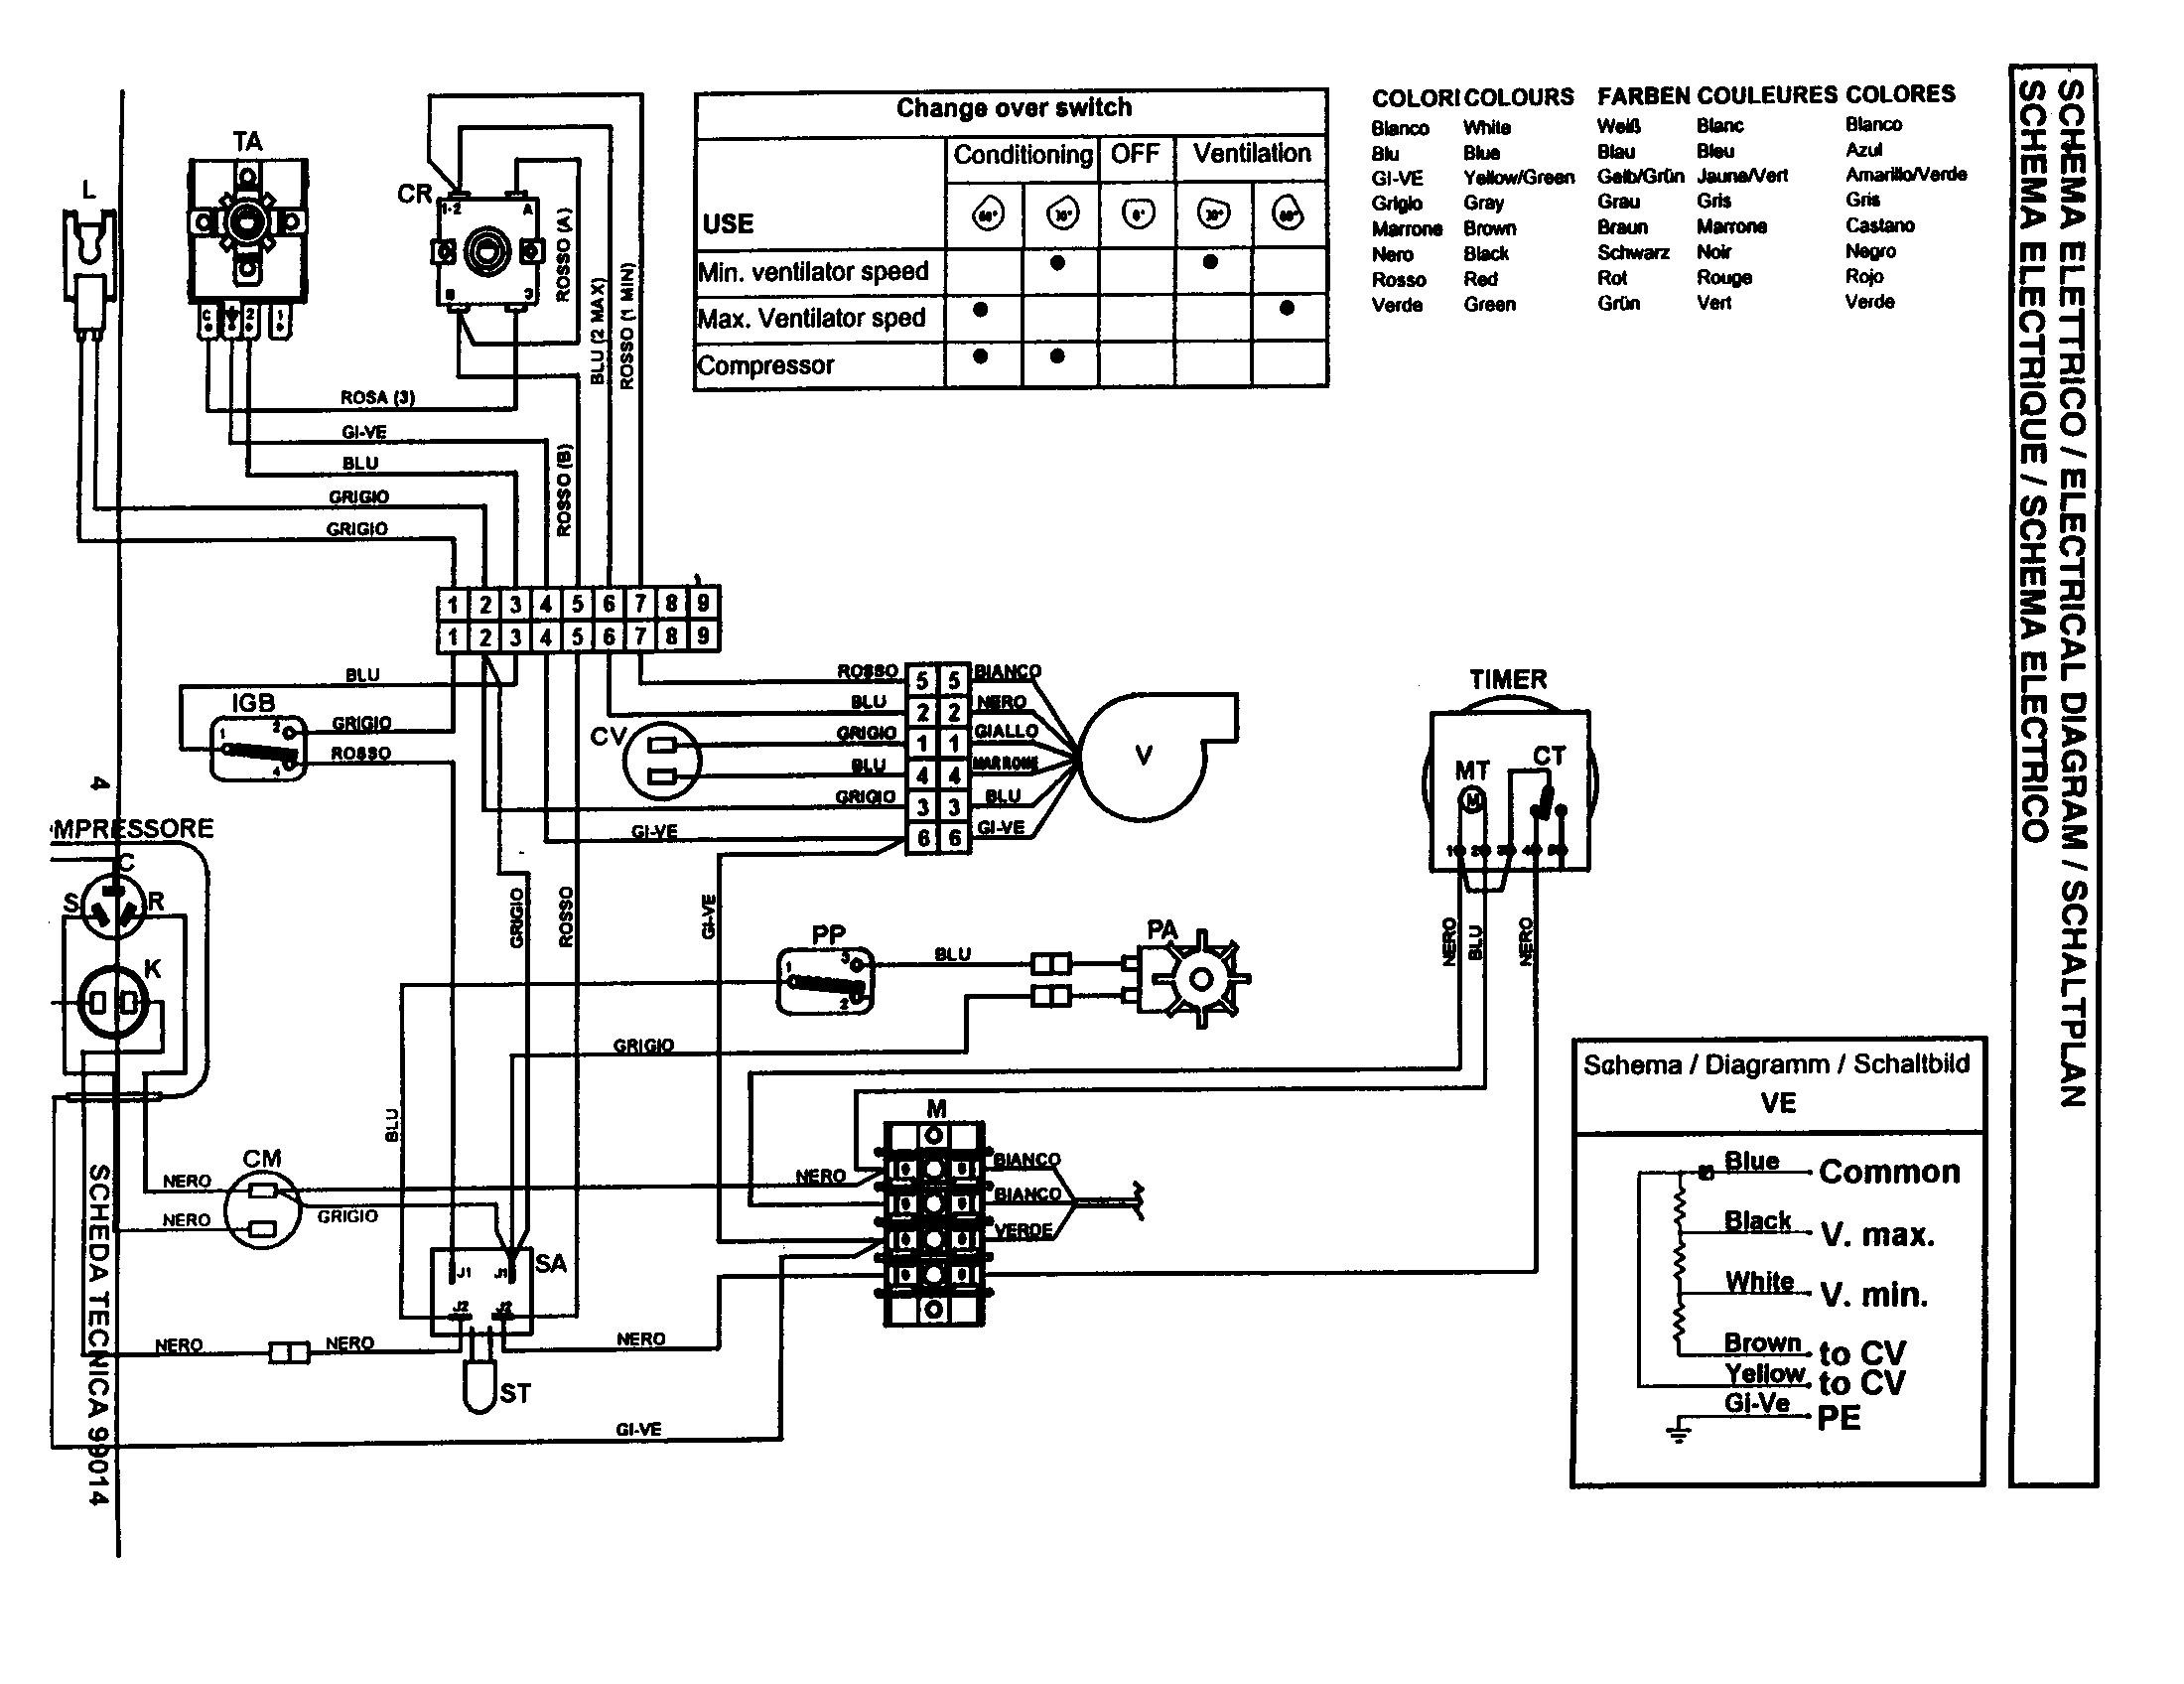 Old Carrier Wiring Diagrams Gas Packs. . Wiring Diagram on